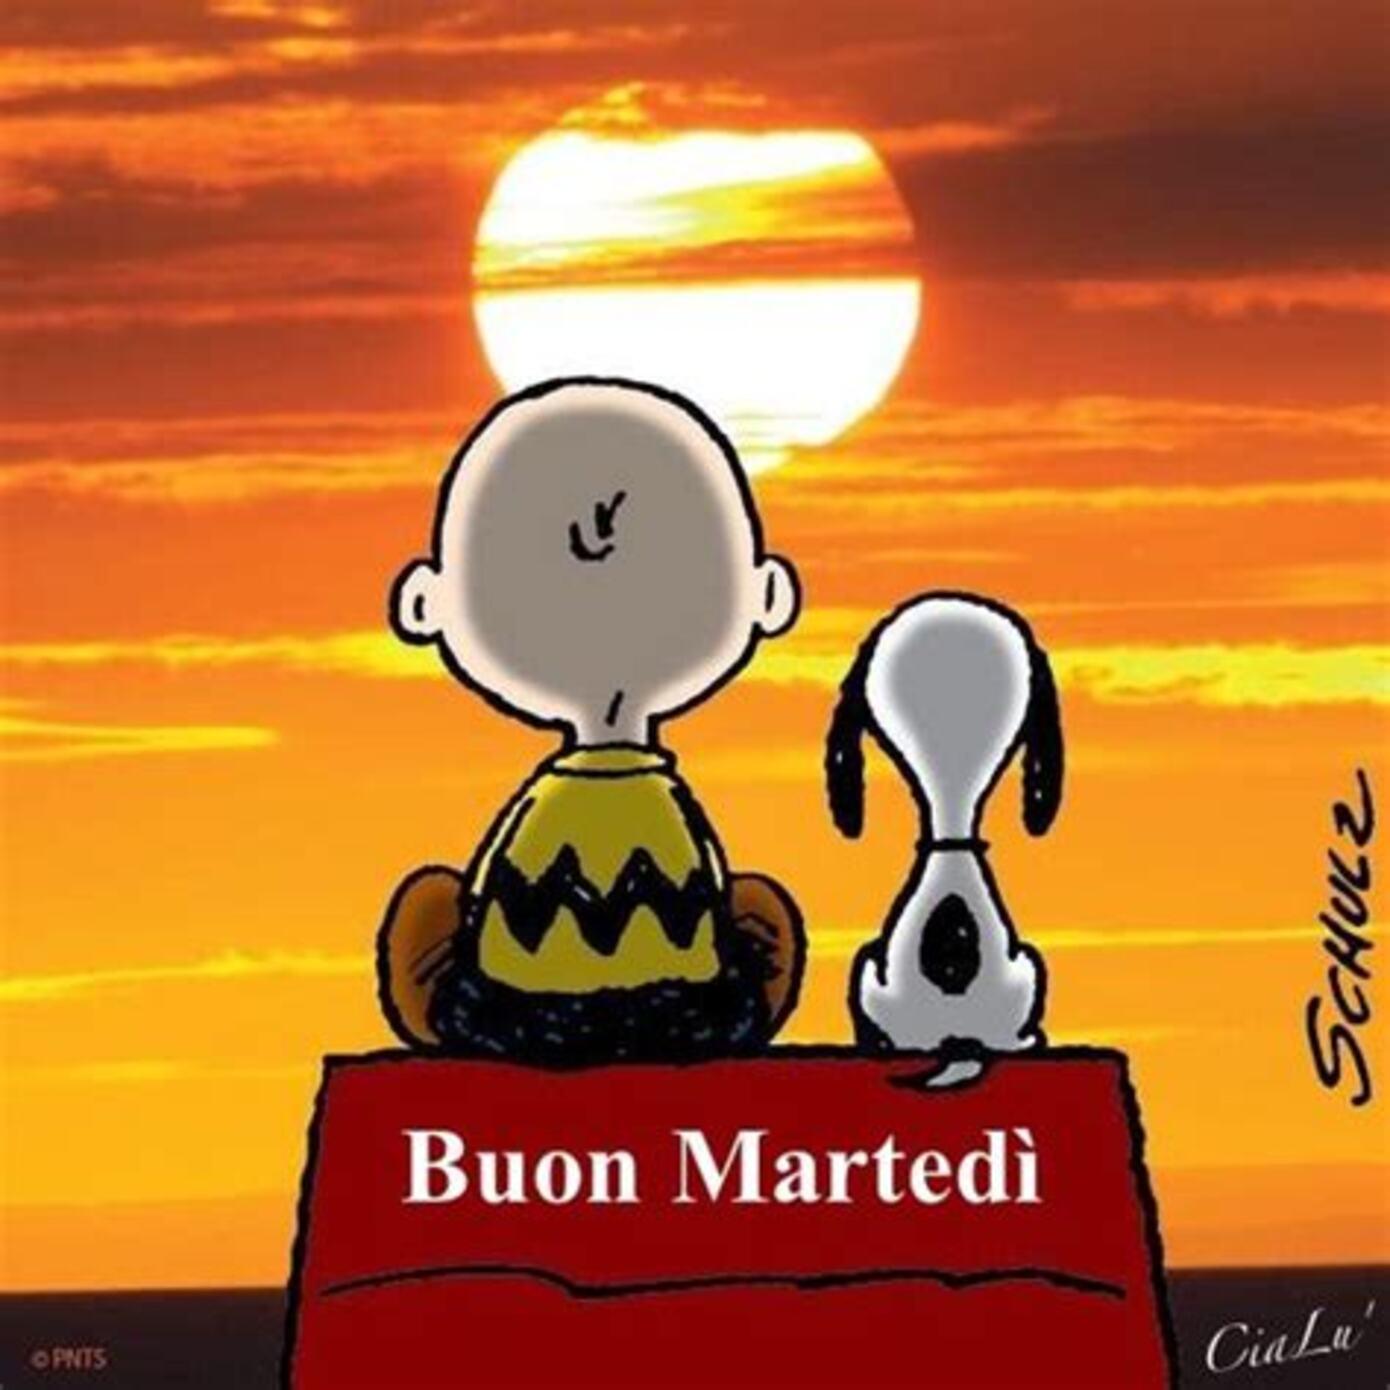 Buon Martedì da Snoopy e Charlie Brown